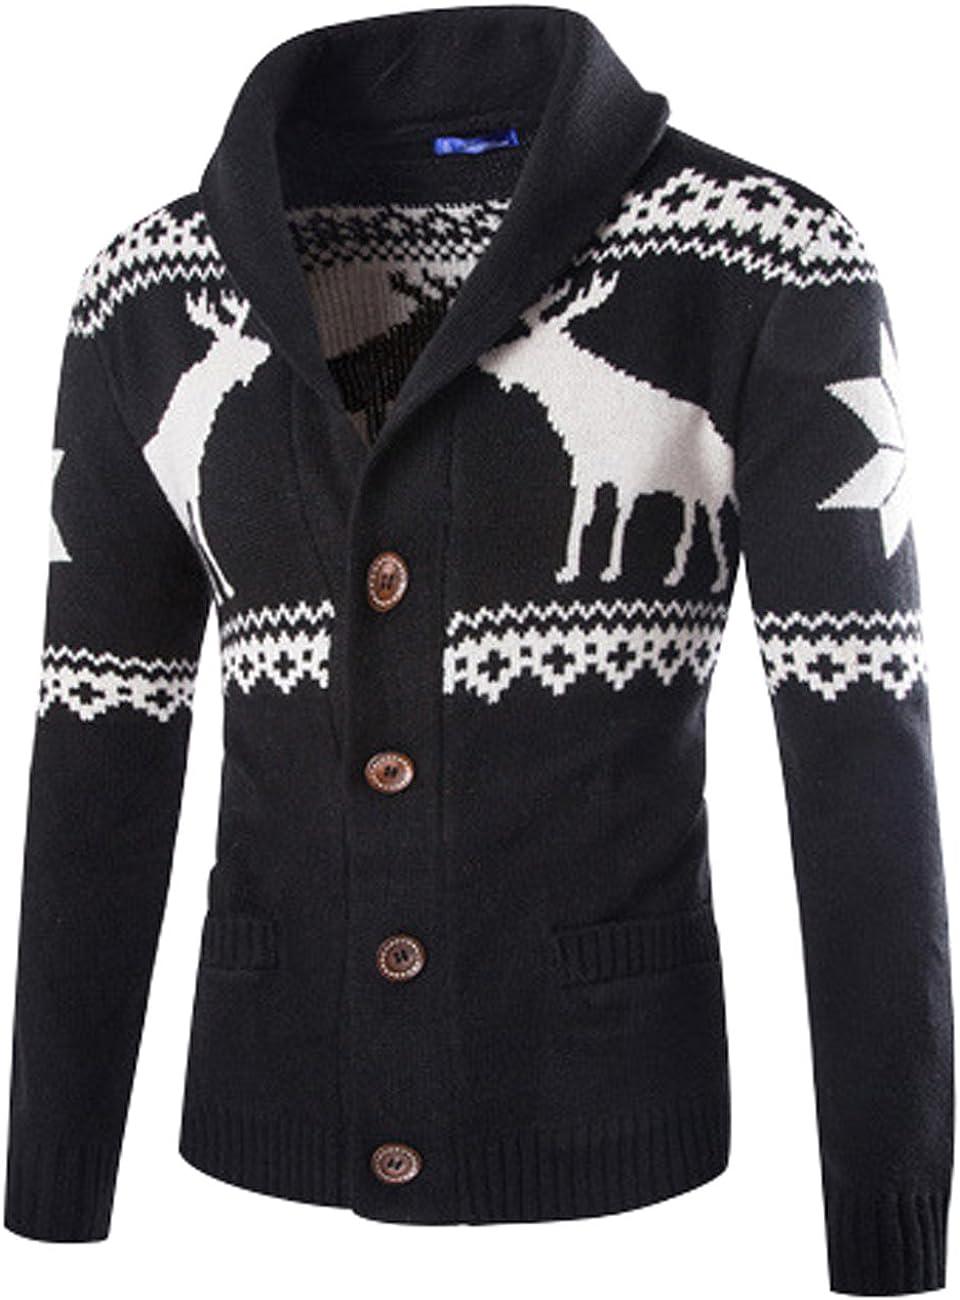 Yolee Men's Deer Knit Sweater Christmas Sweater Cardigan Sweater